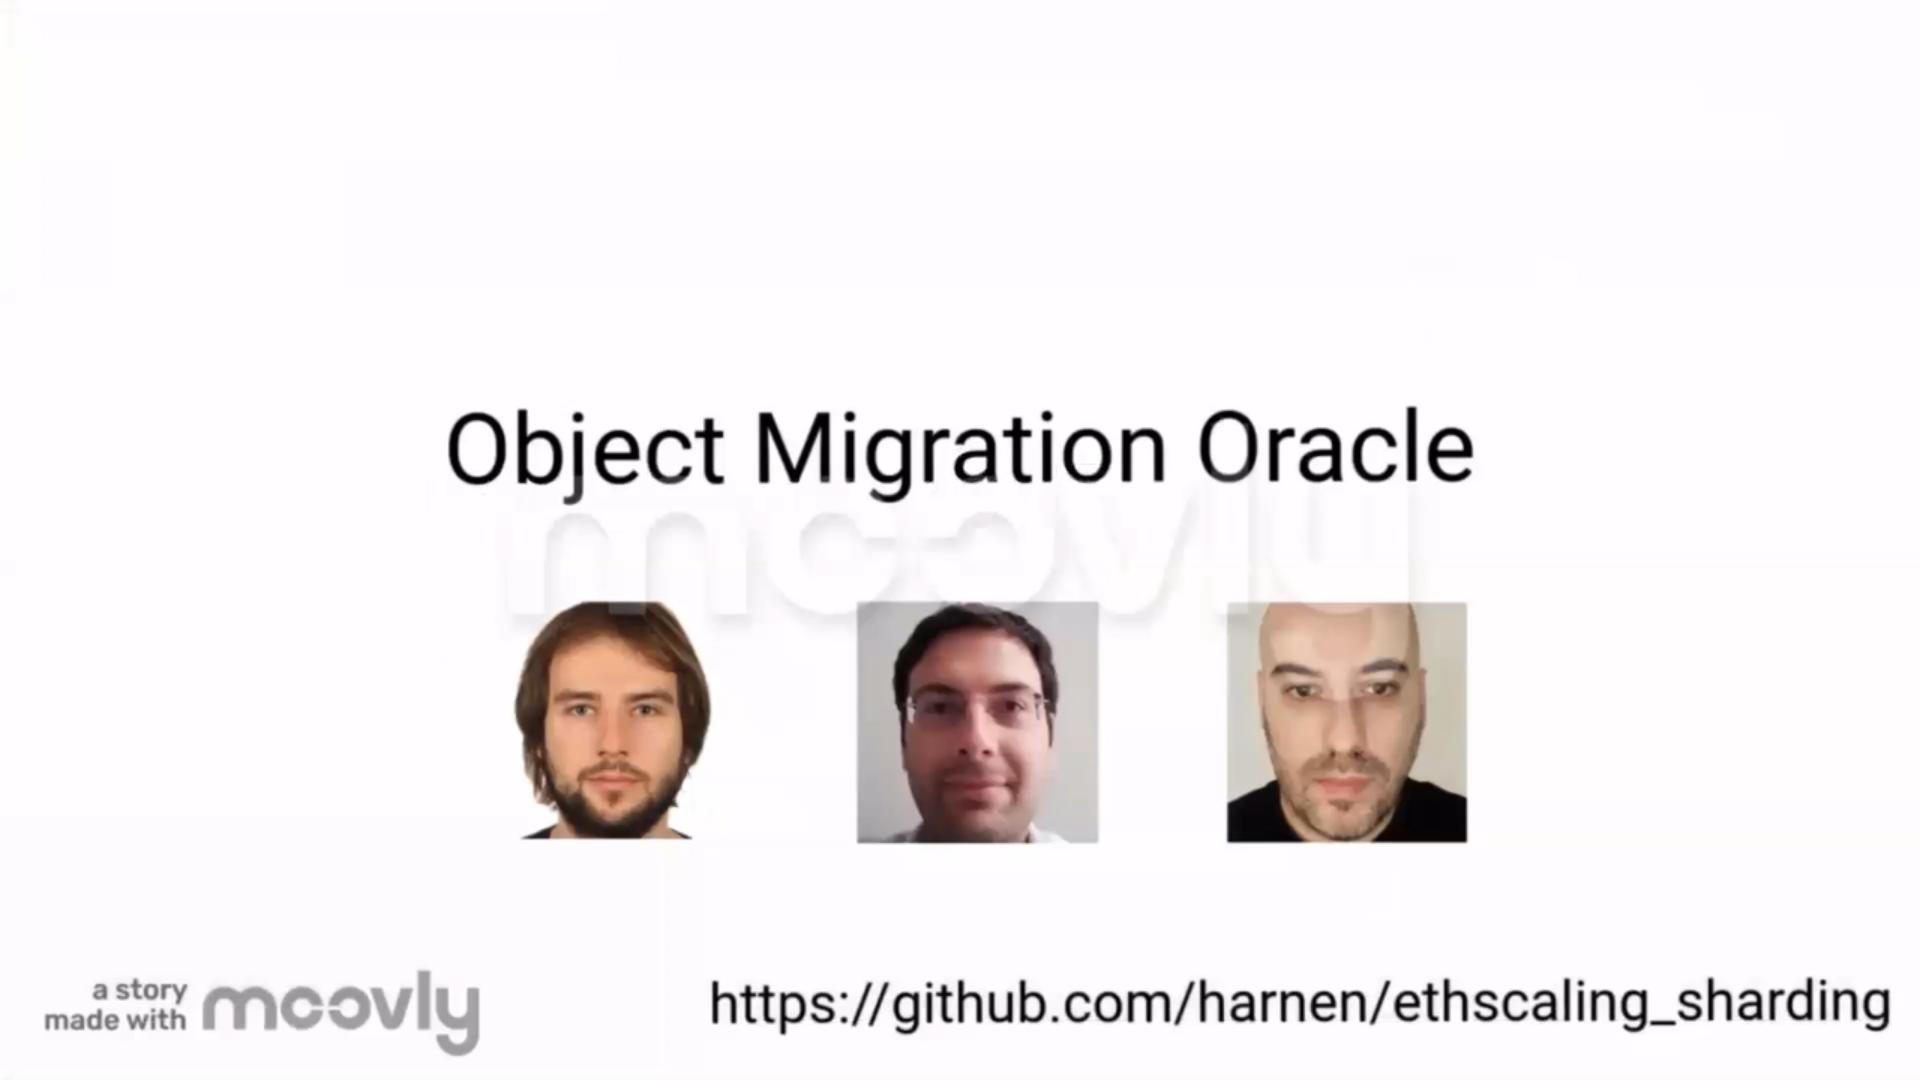 Object Migration Oracle (OMO) showcase